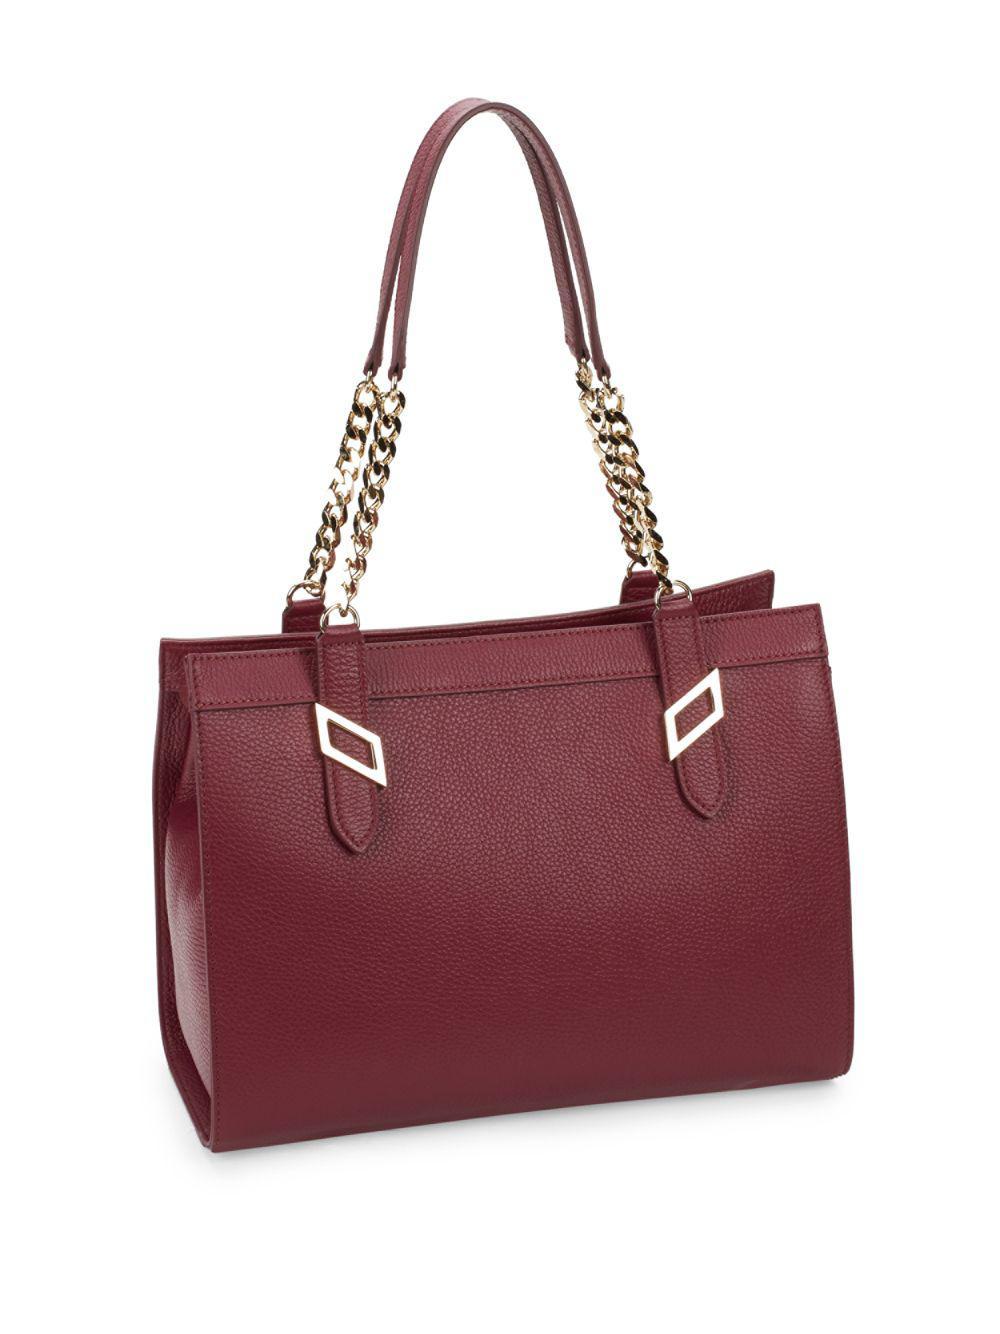 4bdad01e682 Versace Leather Chain Satchel - Lyst